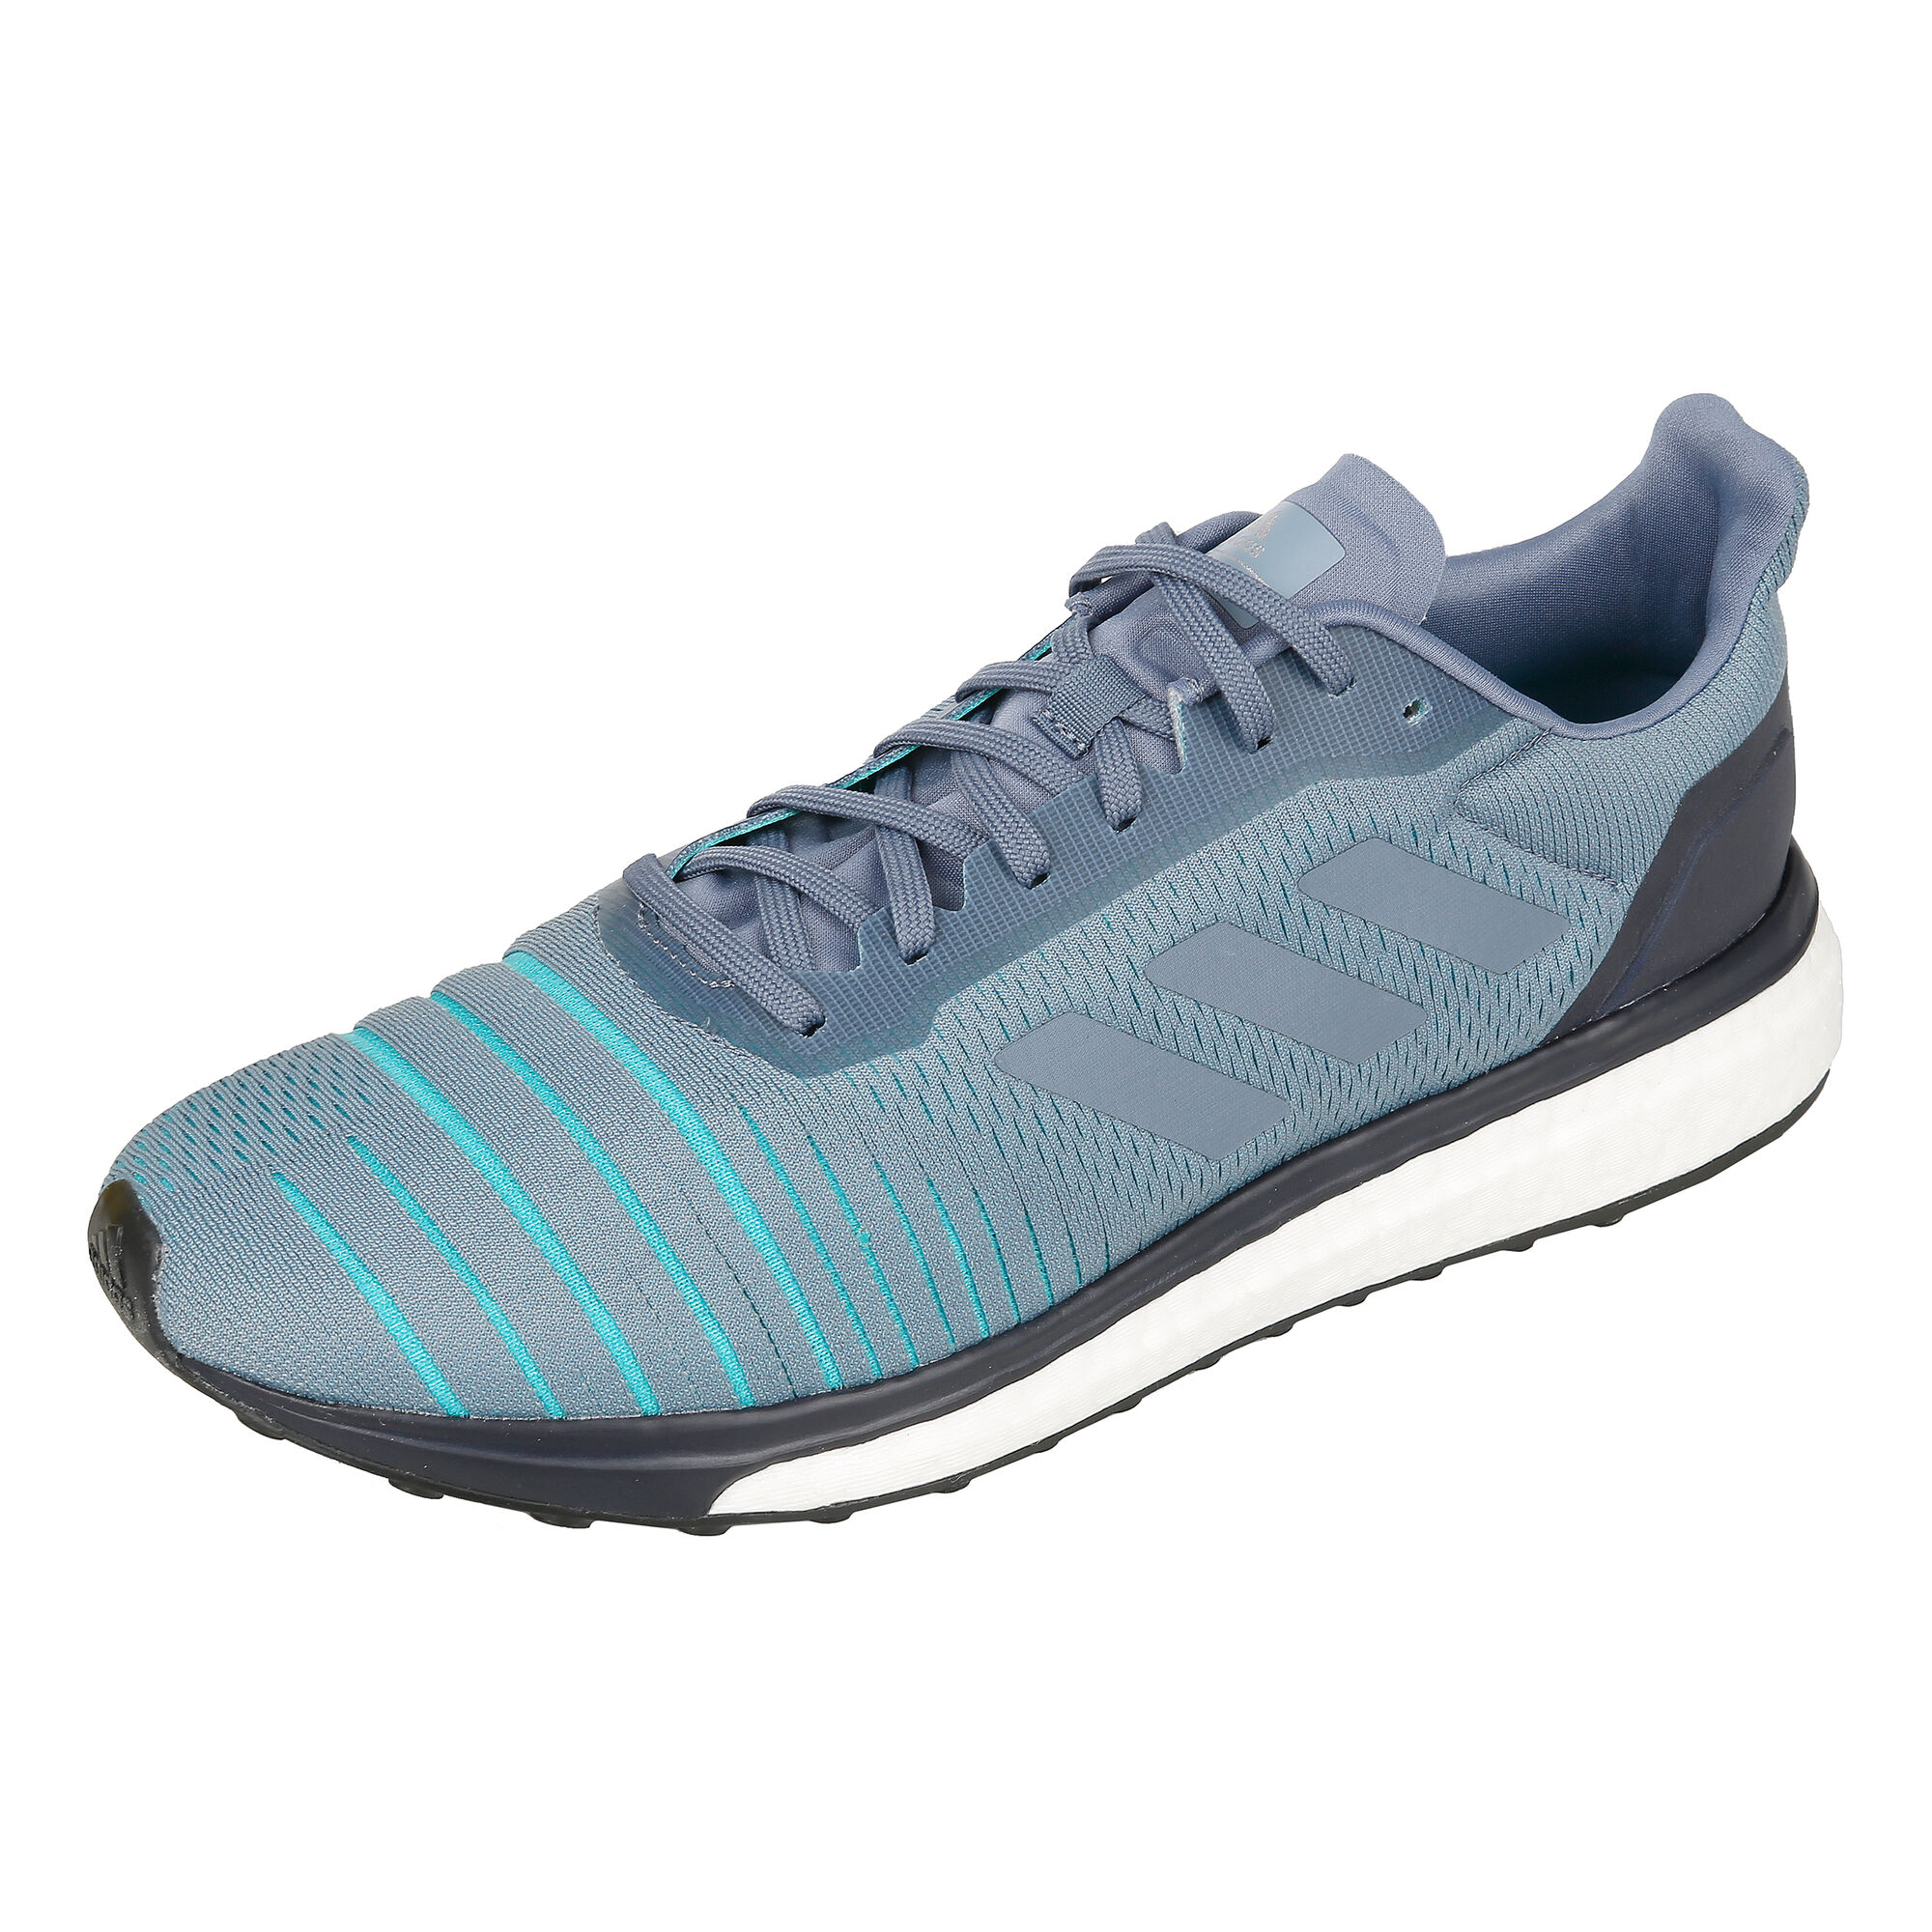 check out 43e58 2ee2d adidas · adidas · adidas · adidas · adidas · adidas · adidas · adidas ·  adidas. Solar Drive Men ...